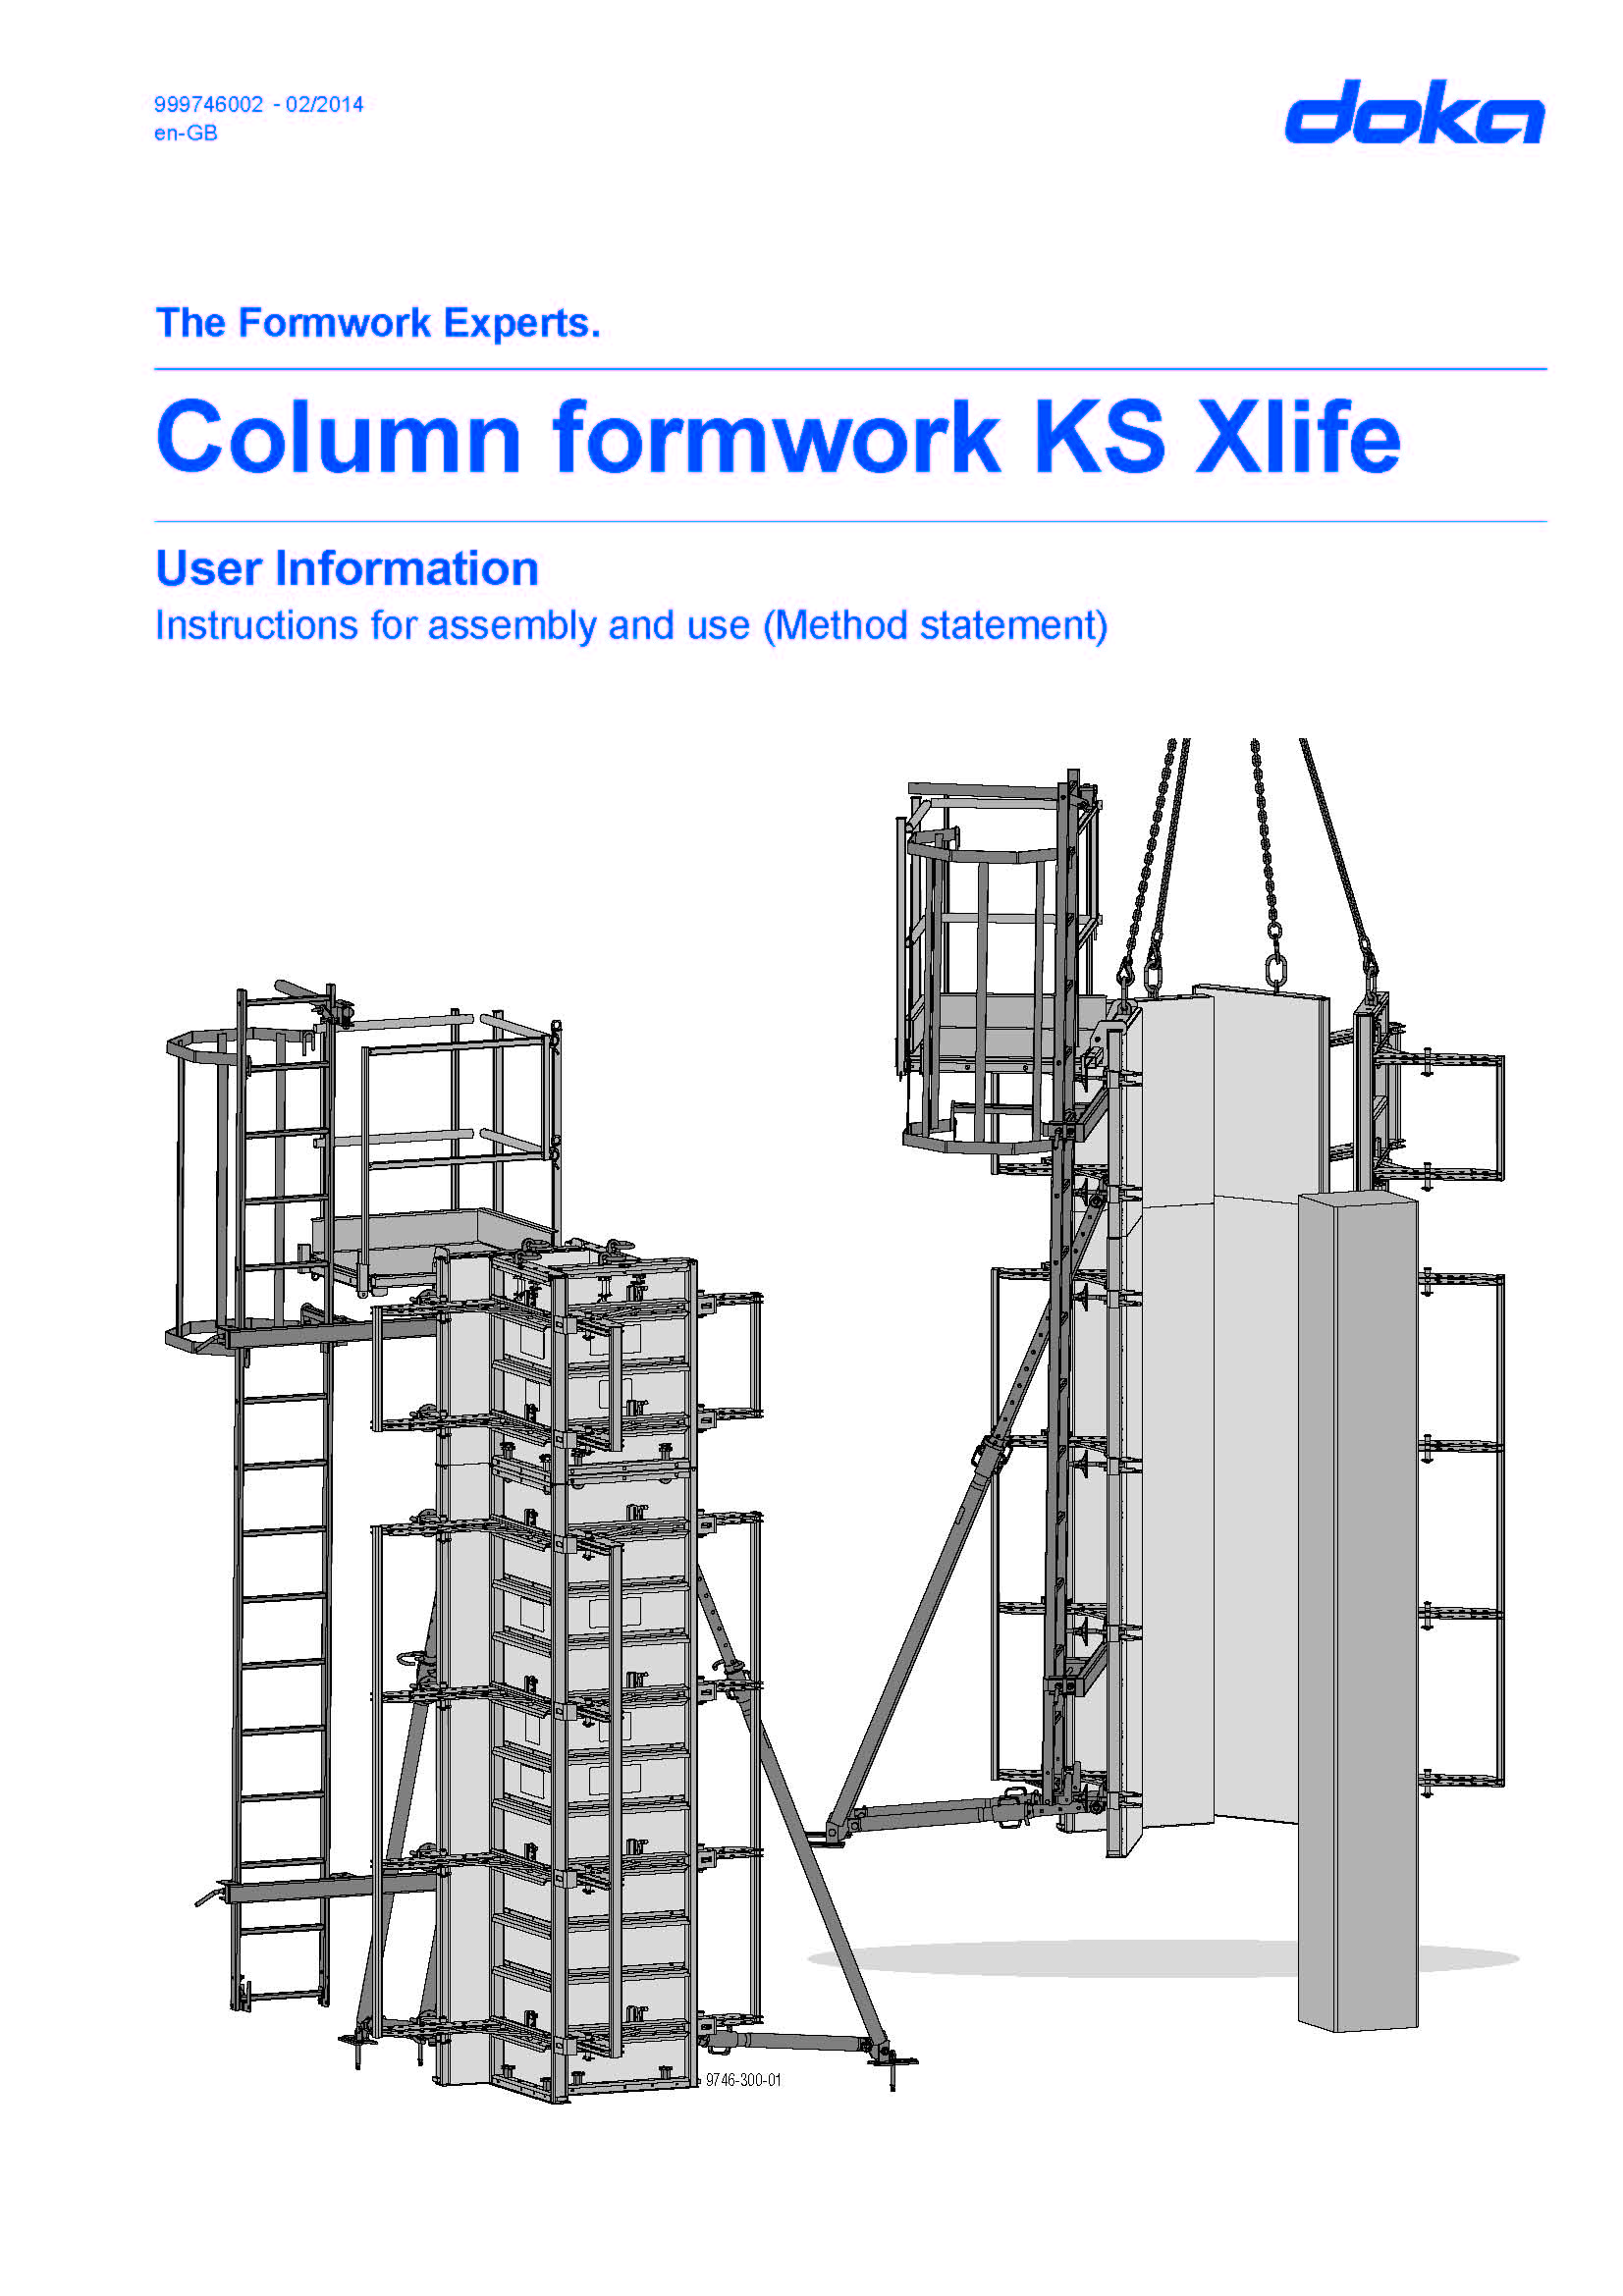 Column Formwork KS Image